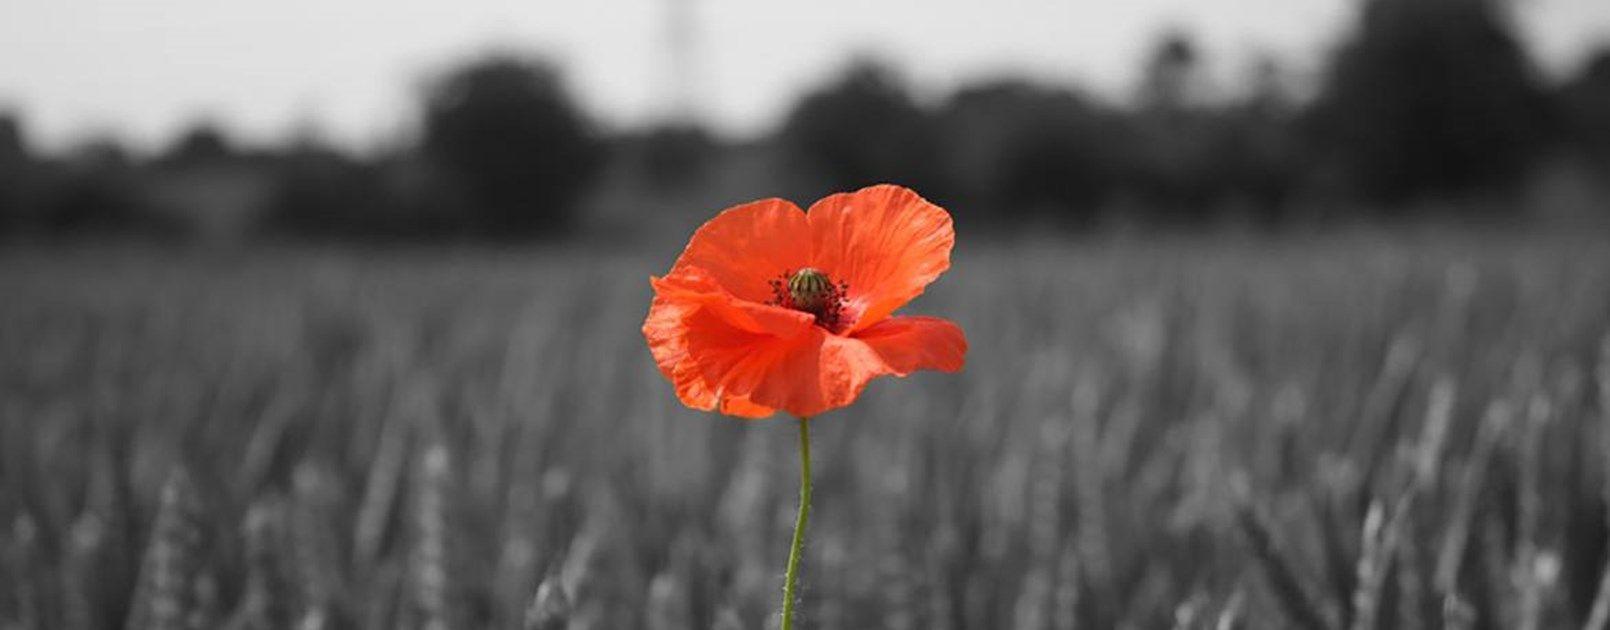 First World War 100 years